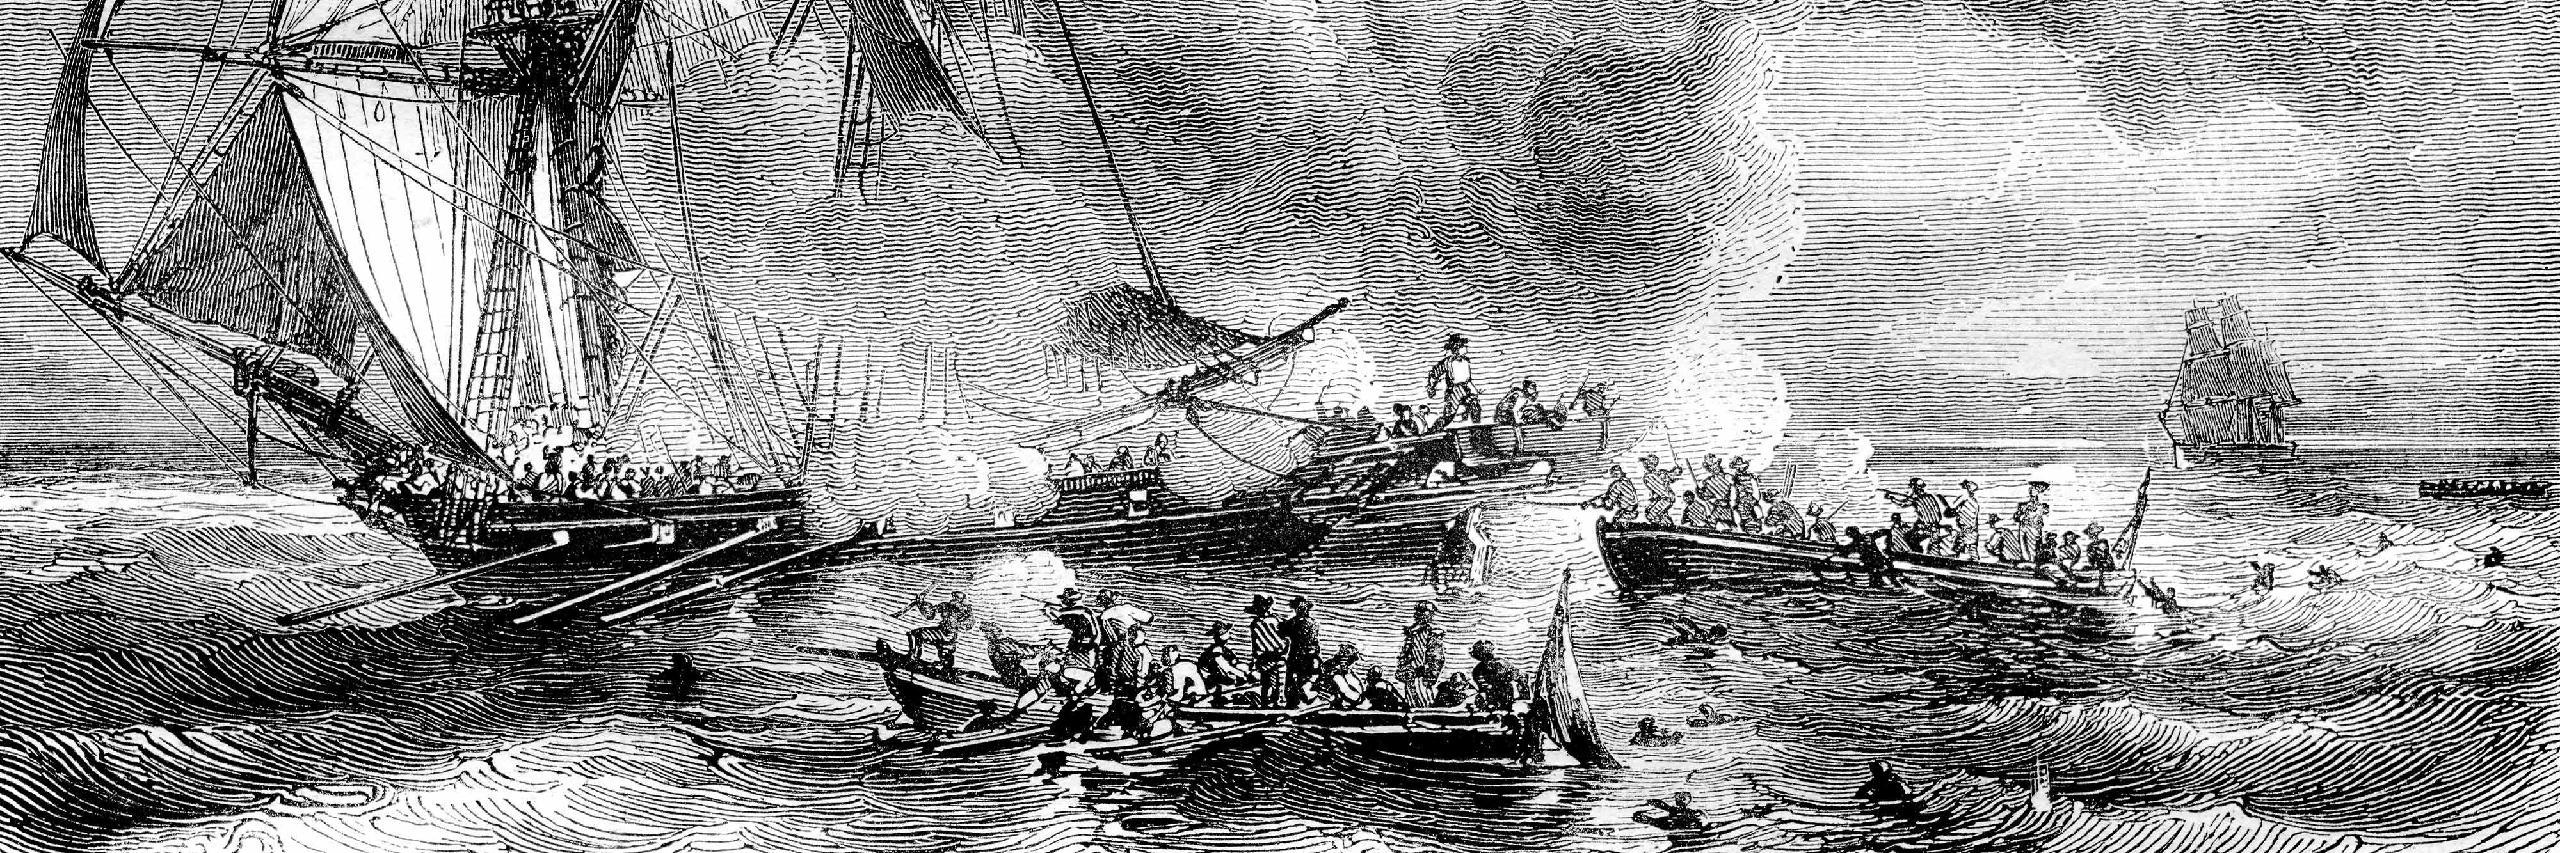 Du'as of the Enslaved: The Malê Slave Rebellion in Bahía, Brazil